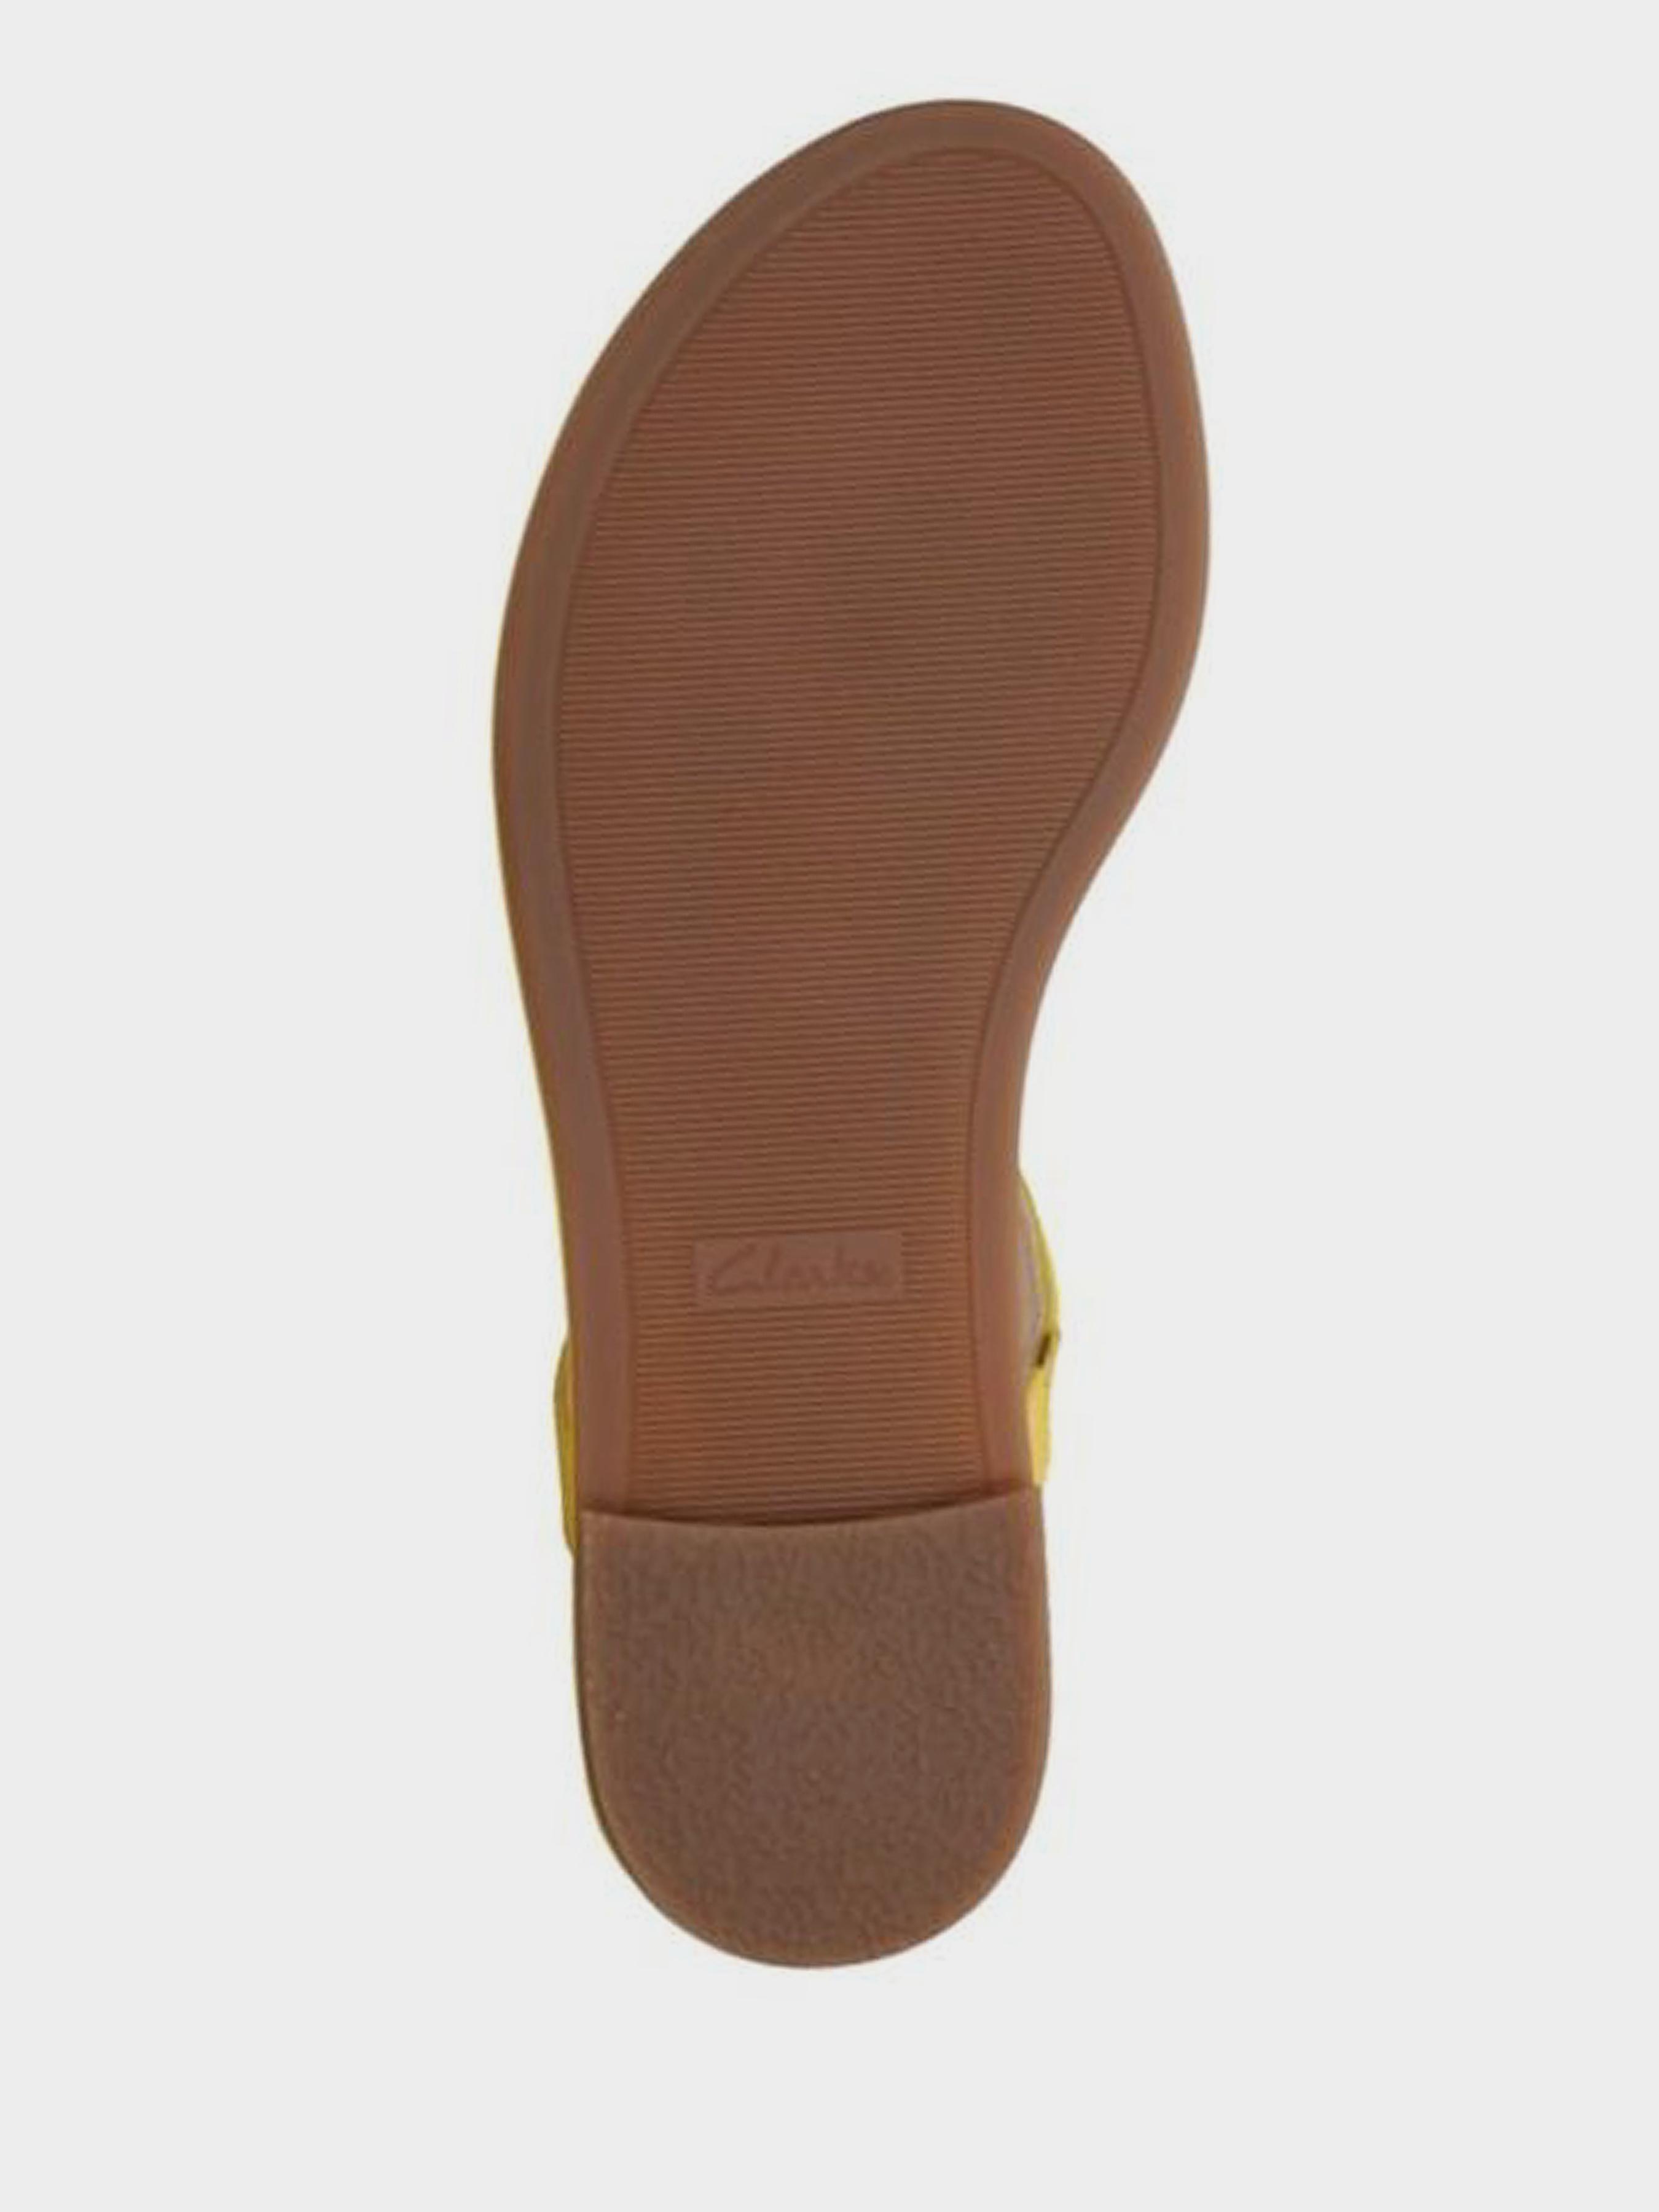 Сандалии женские Clarks Bay Poppy OW4406 размеры обуви, 2017